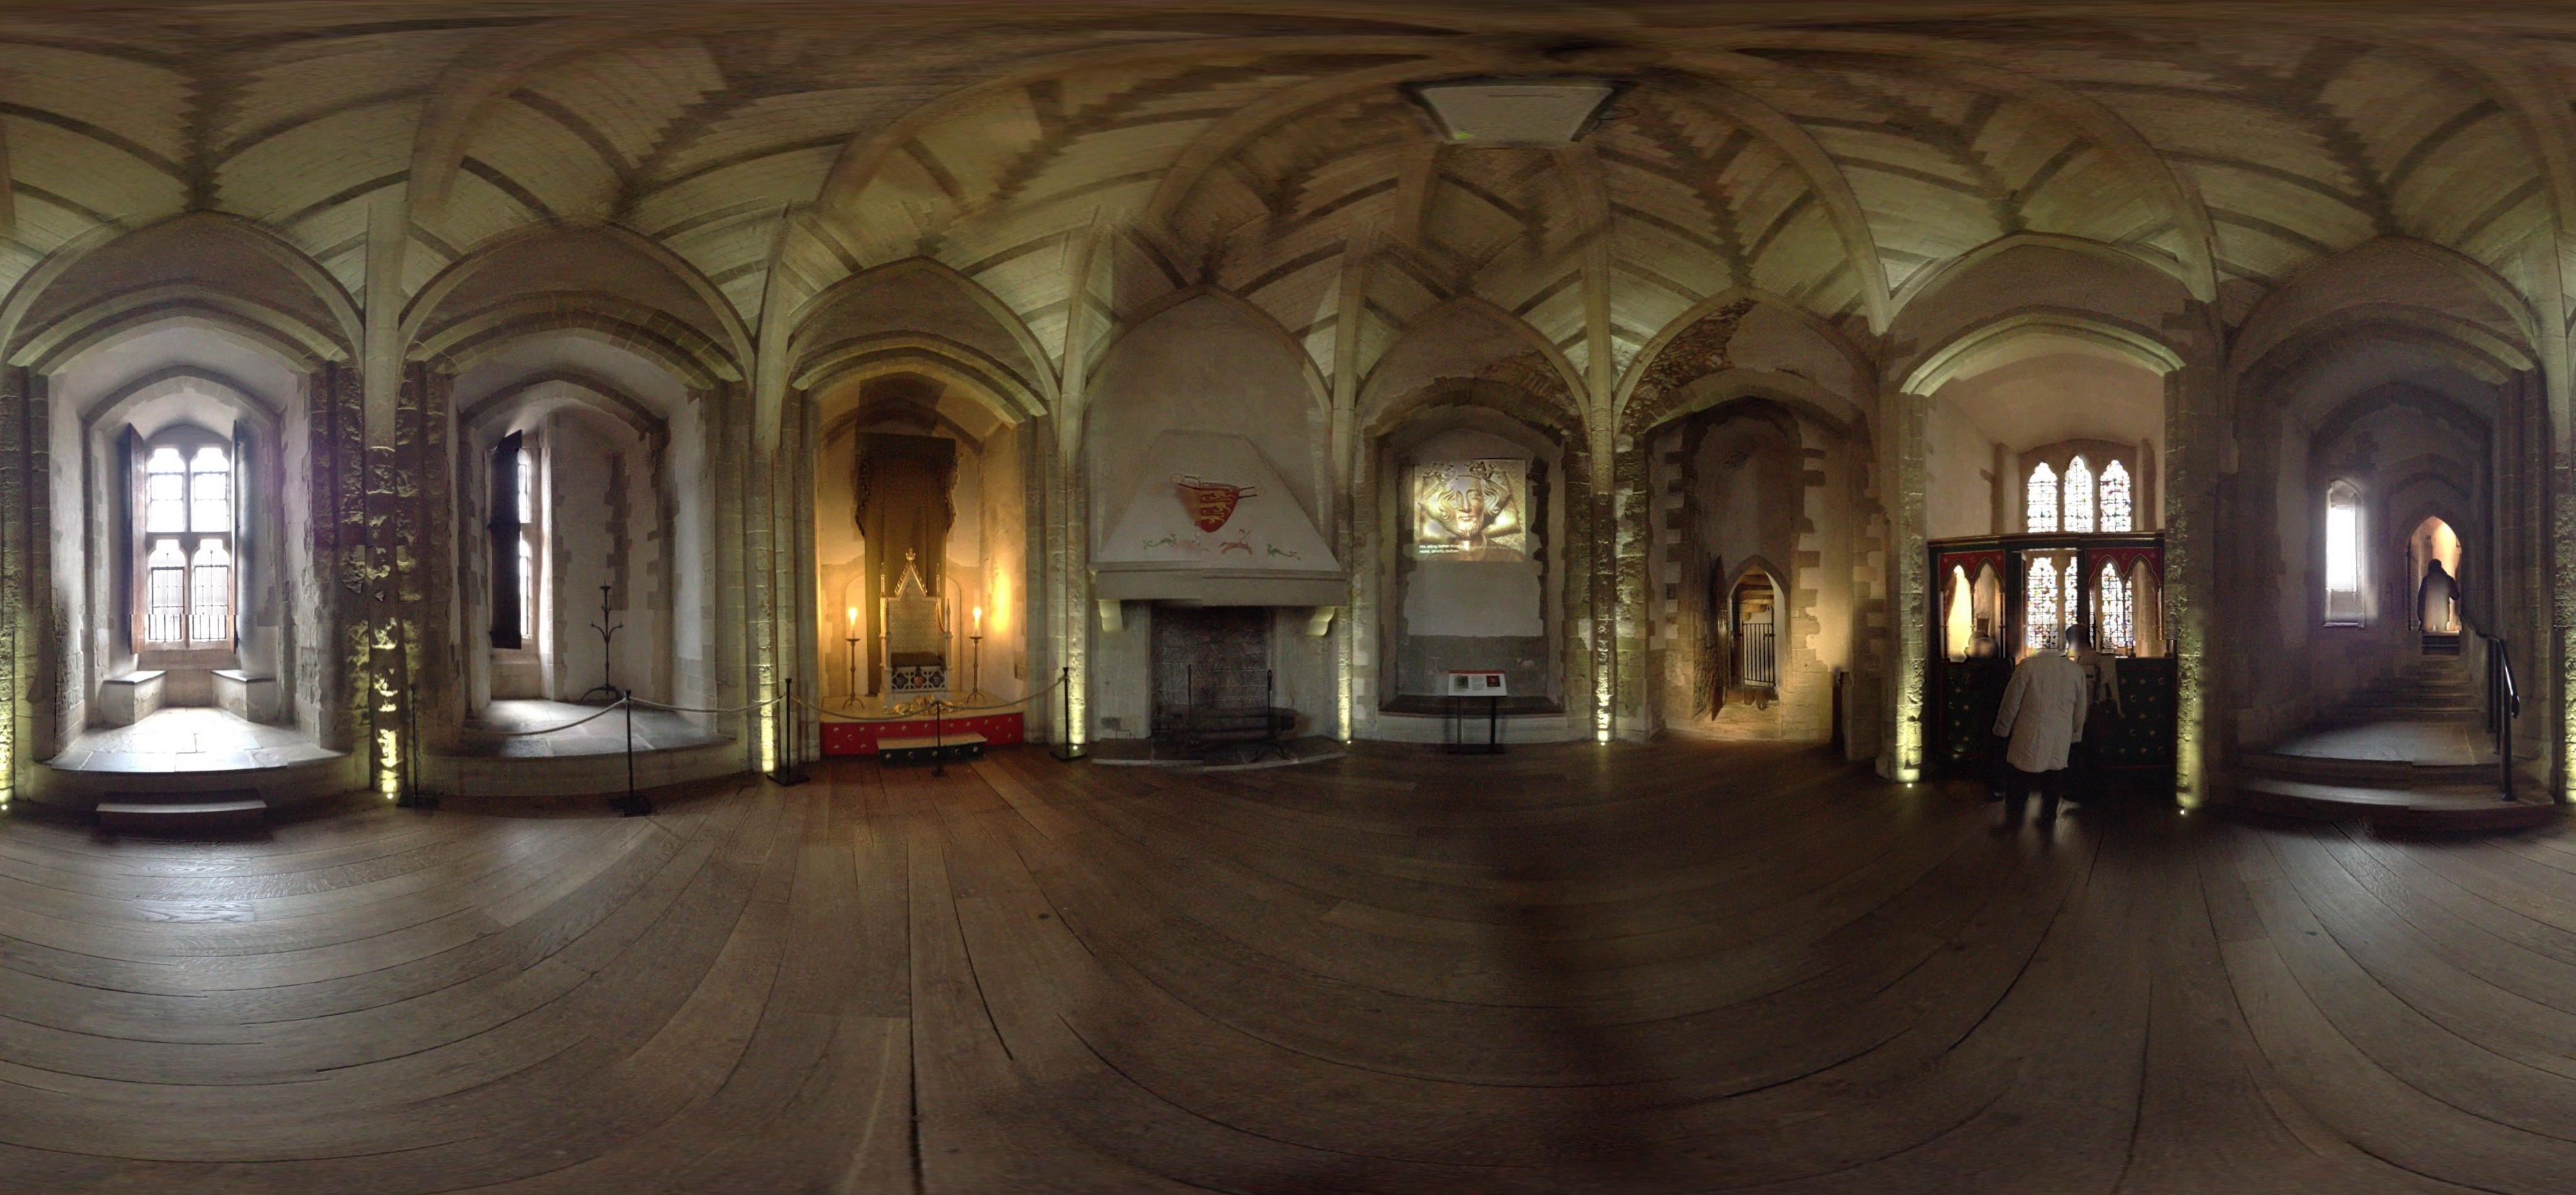 Interior tower of london castles of britain ireland for London interiors